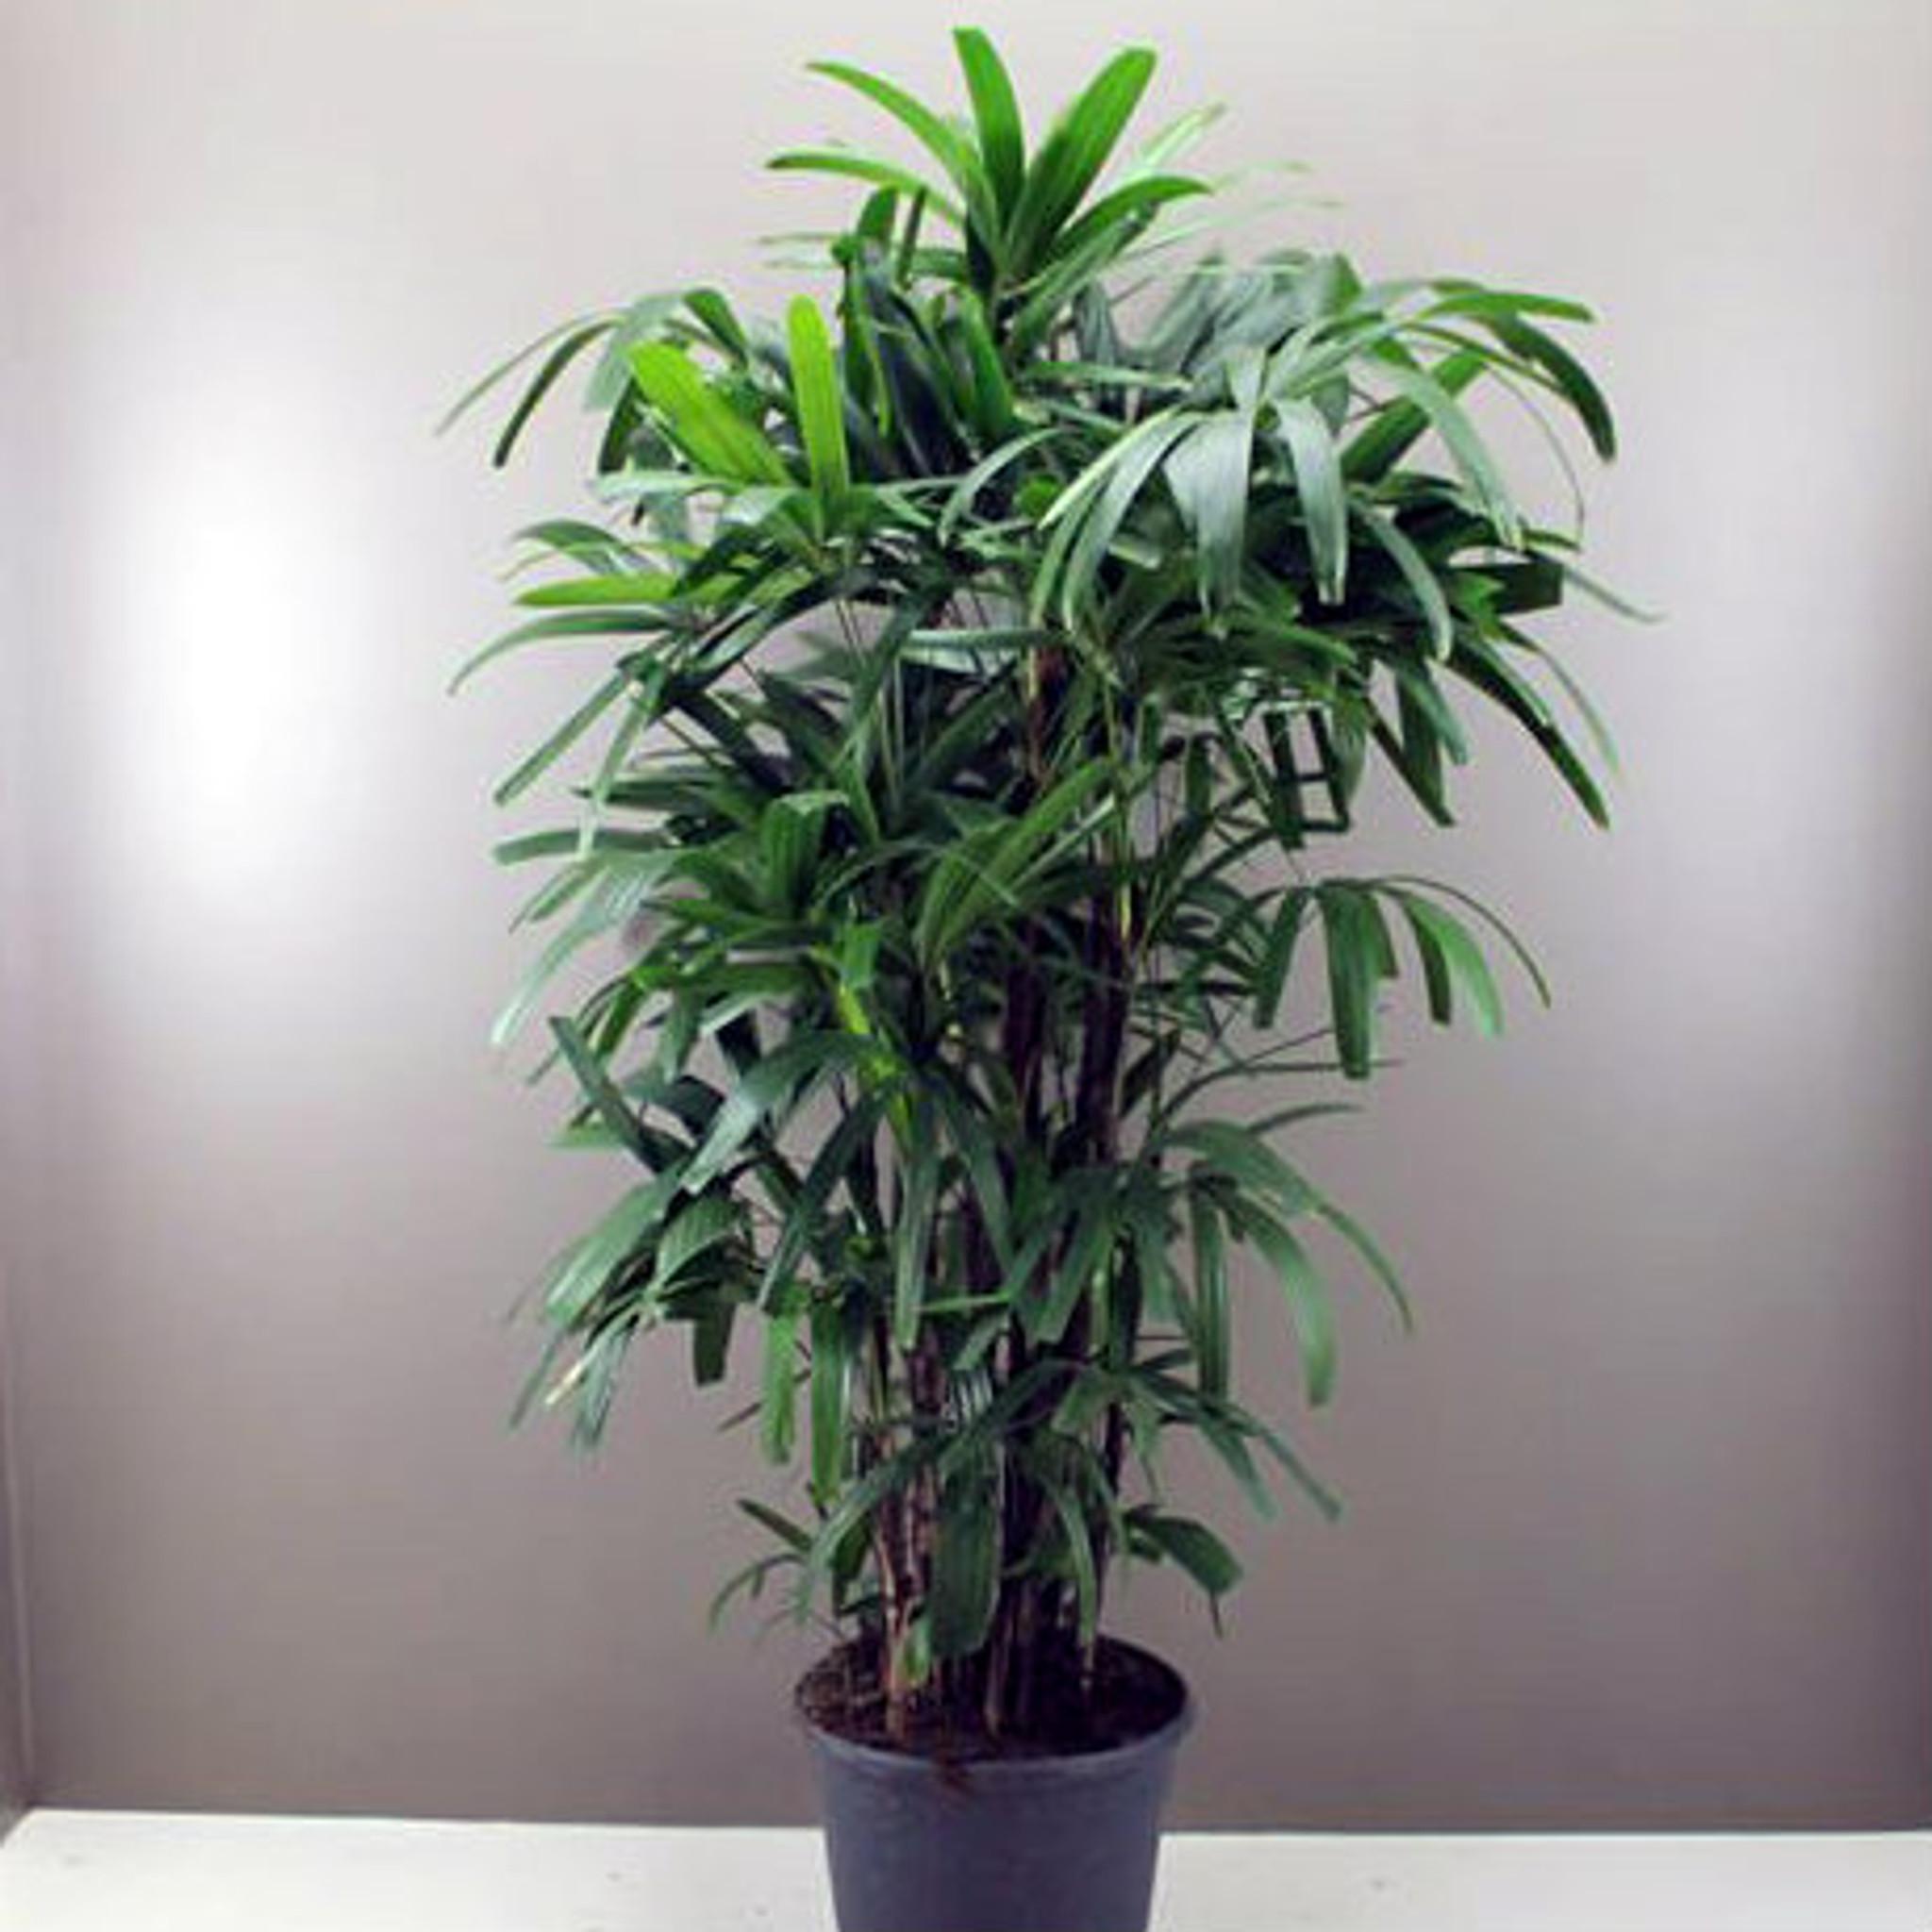 Giant Lady Palm